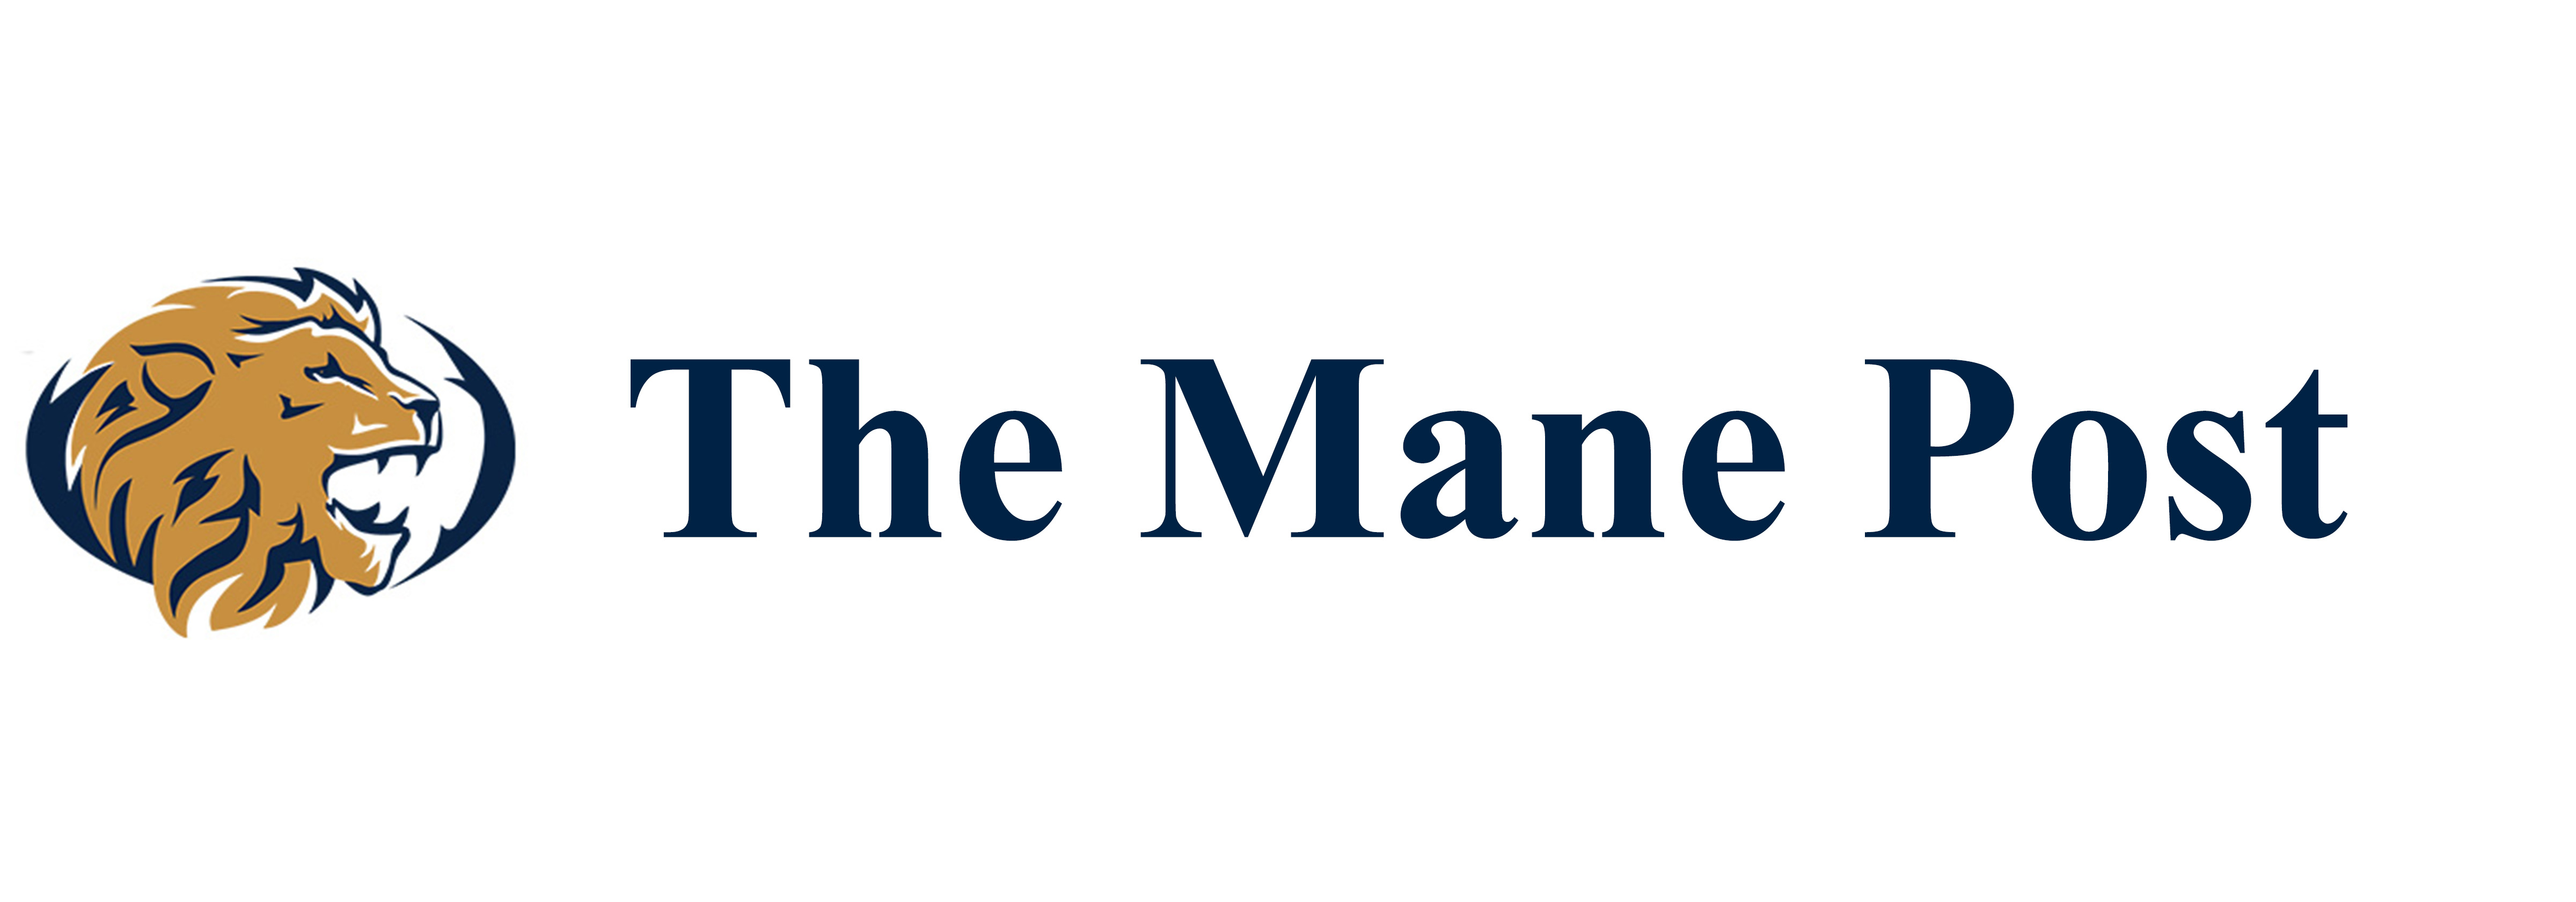 The Mane Post